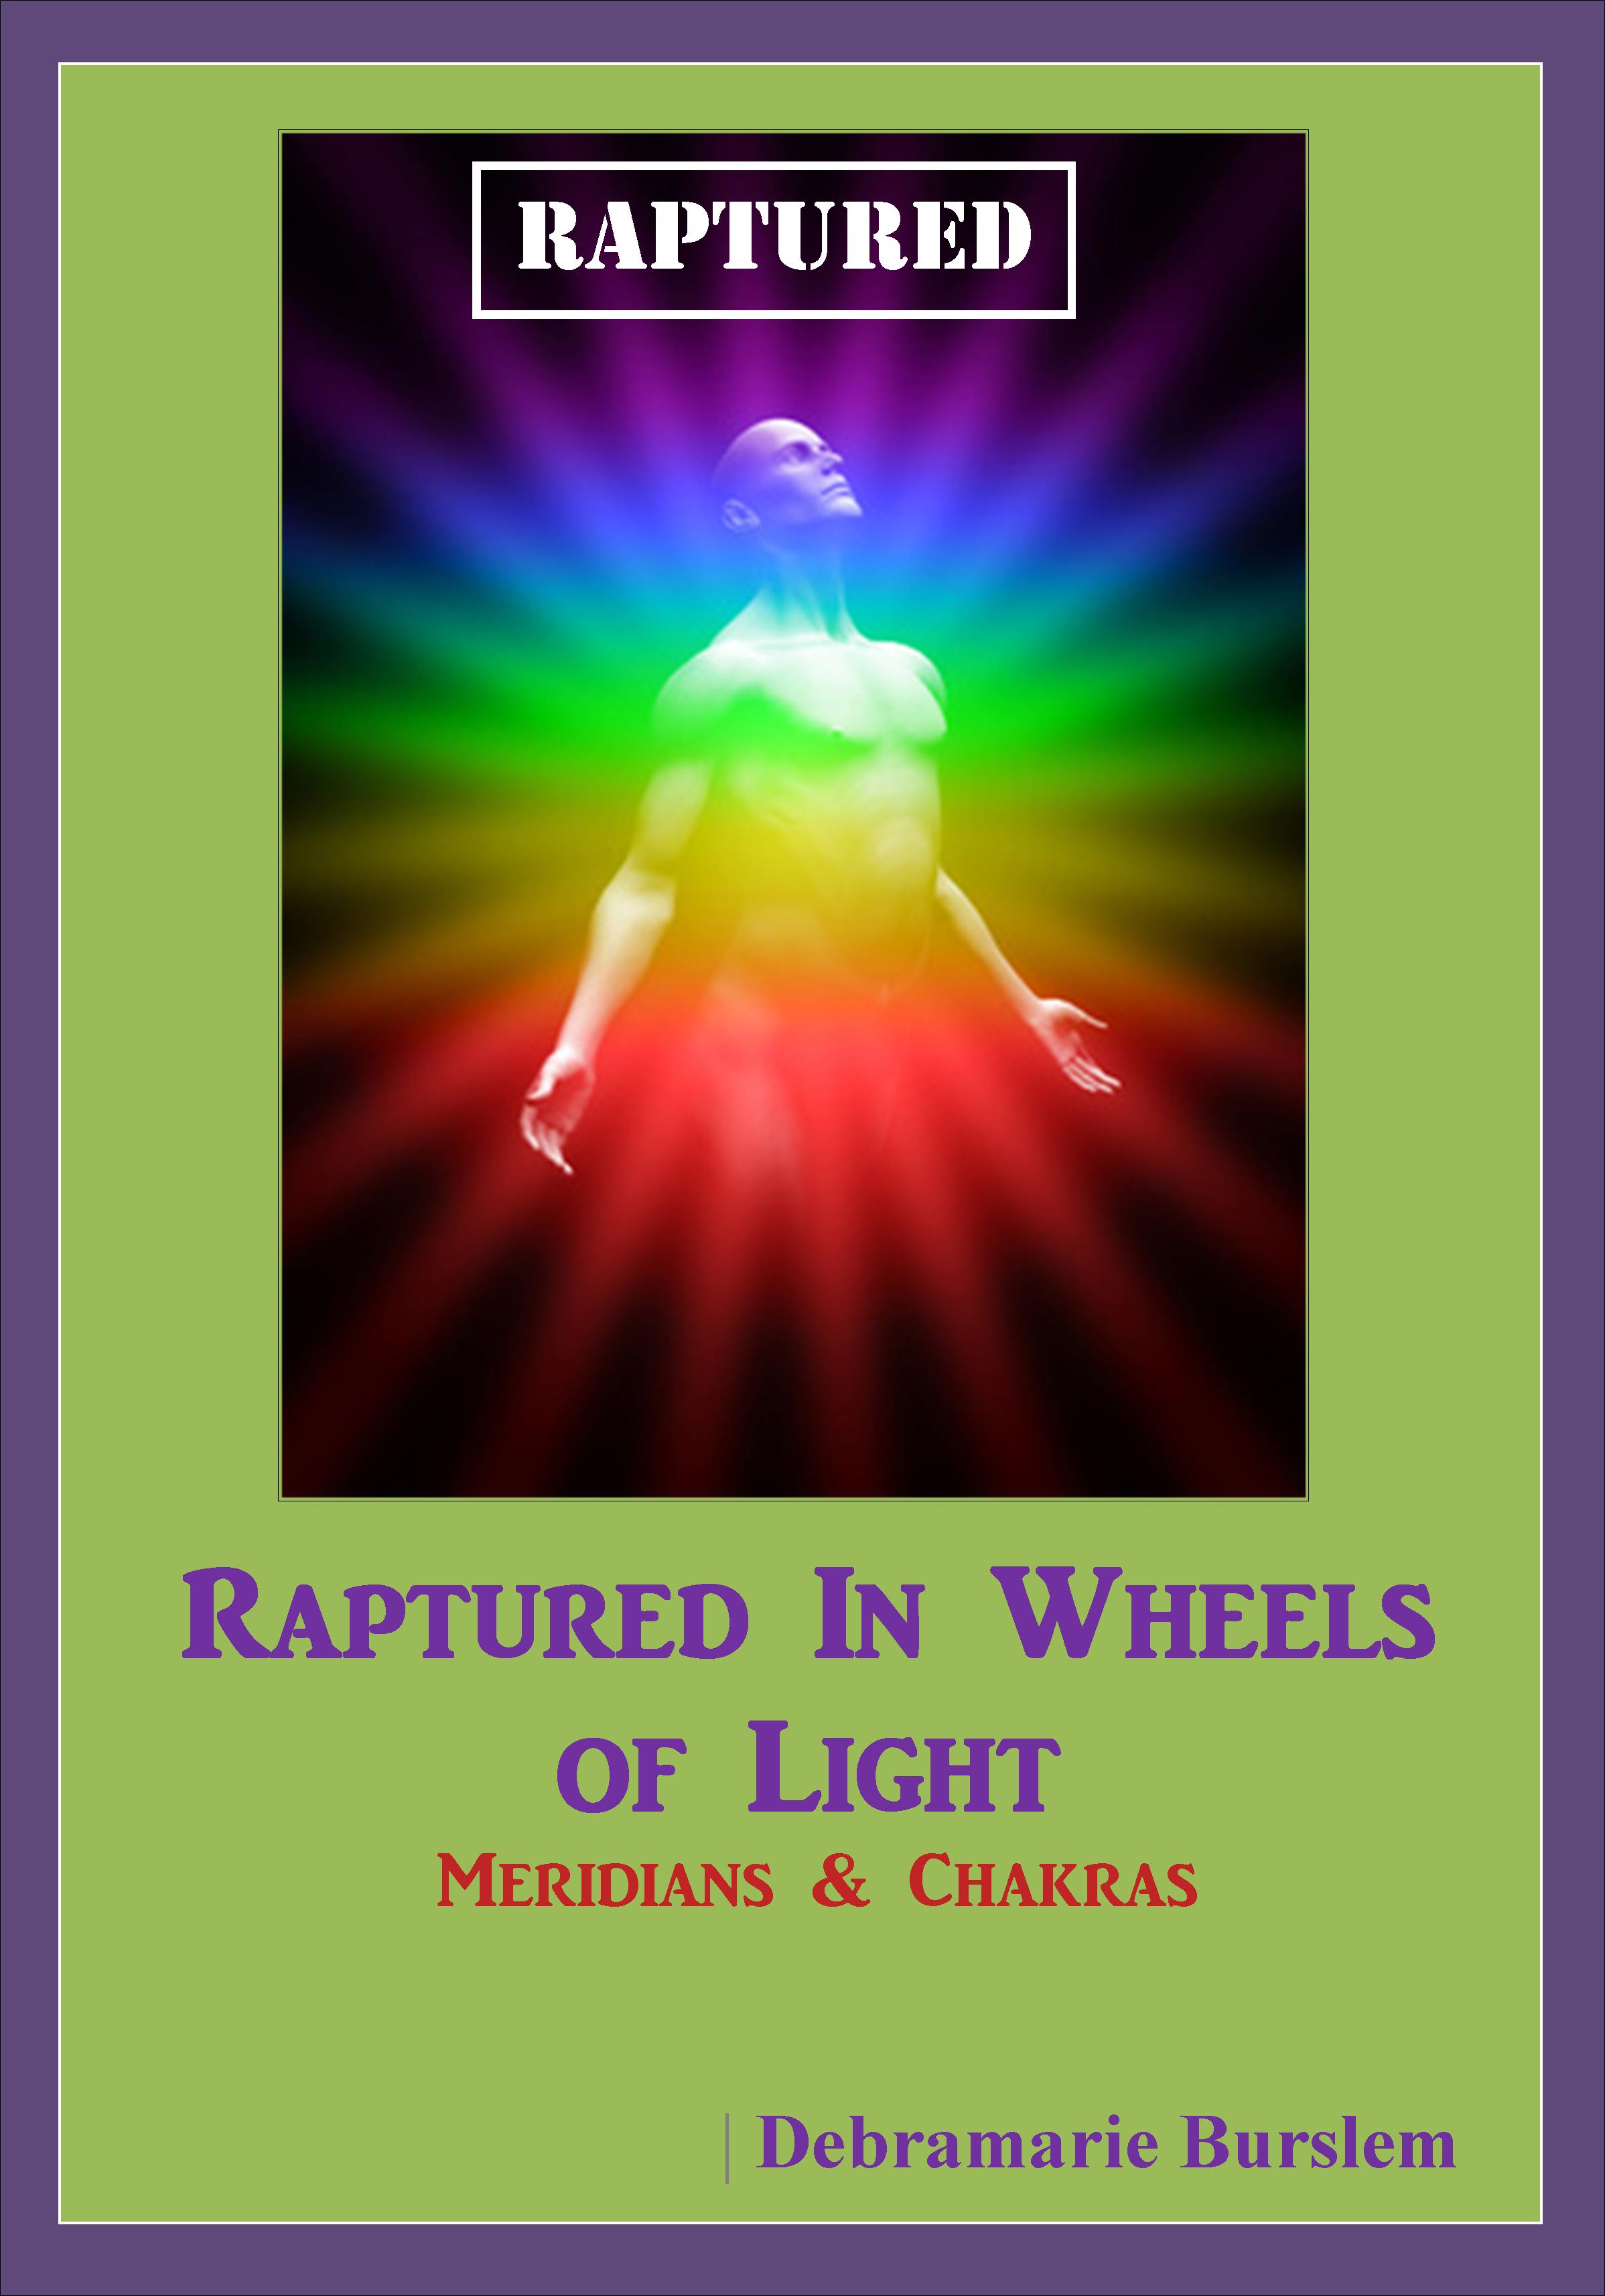 New eBook – Raptured In Wheels of Light